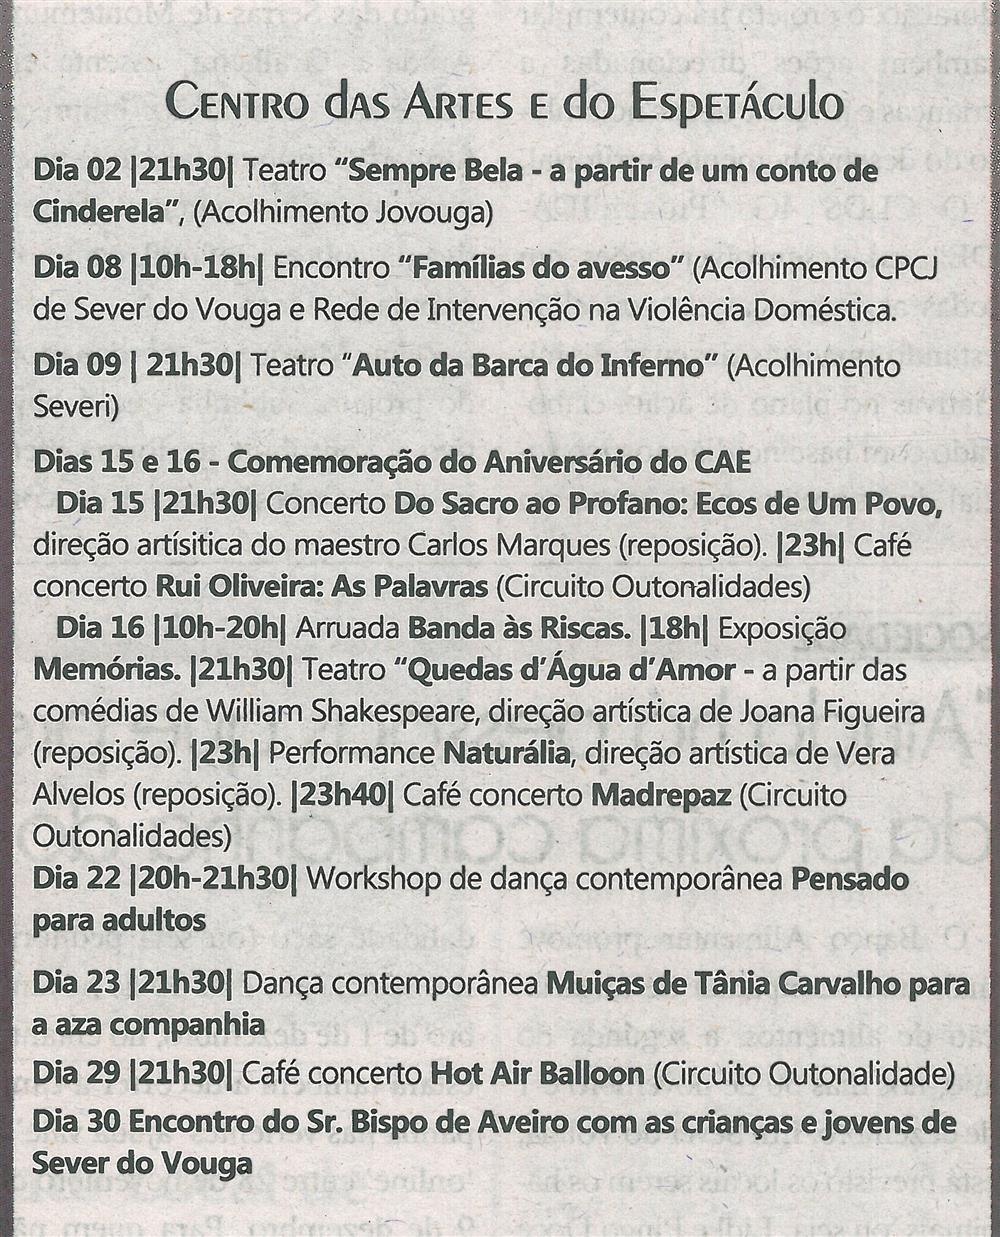 TV-nov.'19-p.19-Agenda Cultural [de] Novembro : Centro das Artes e do Espetáculo.jpg